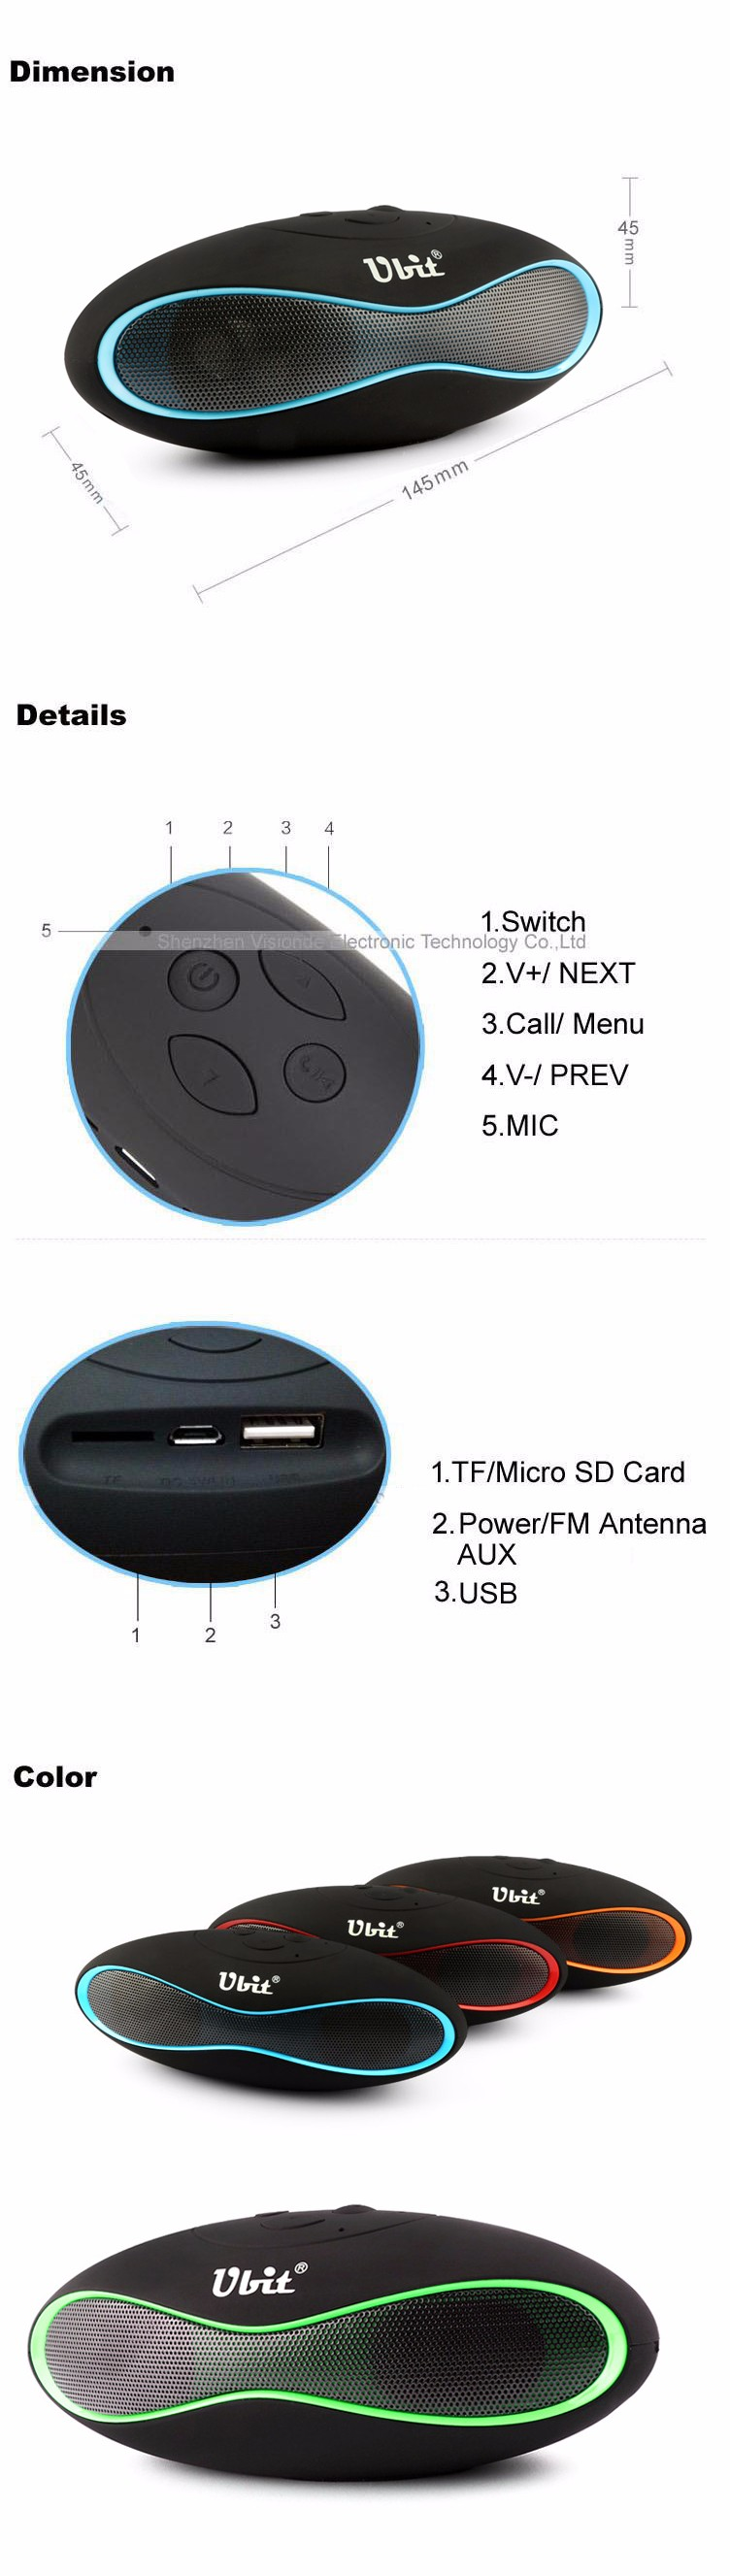 X6U bluetooth speaker spain (1)